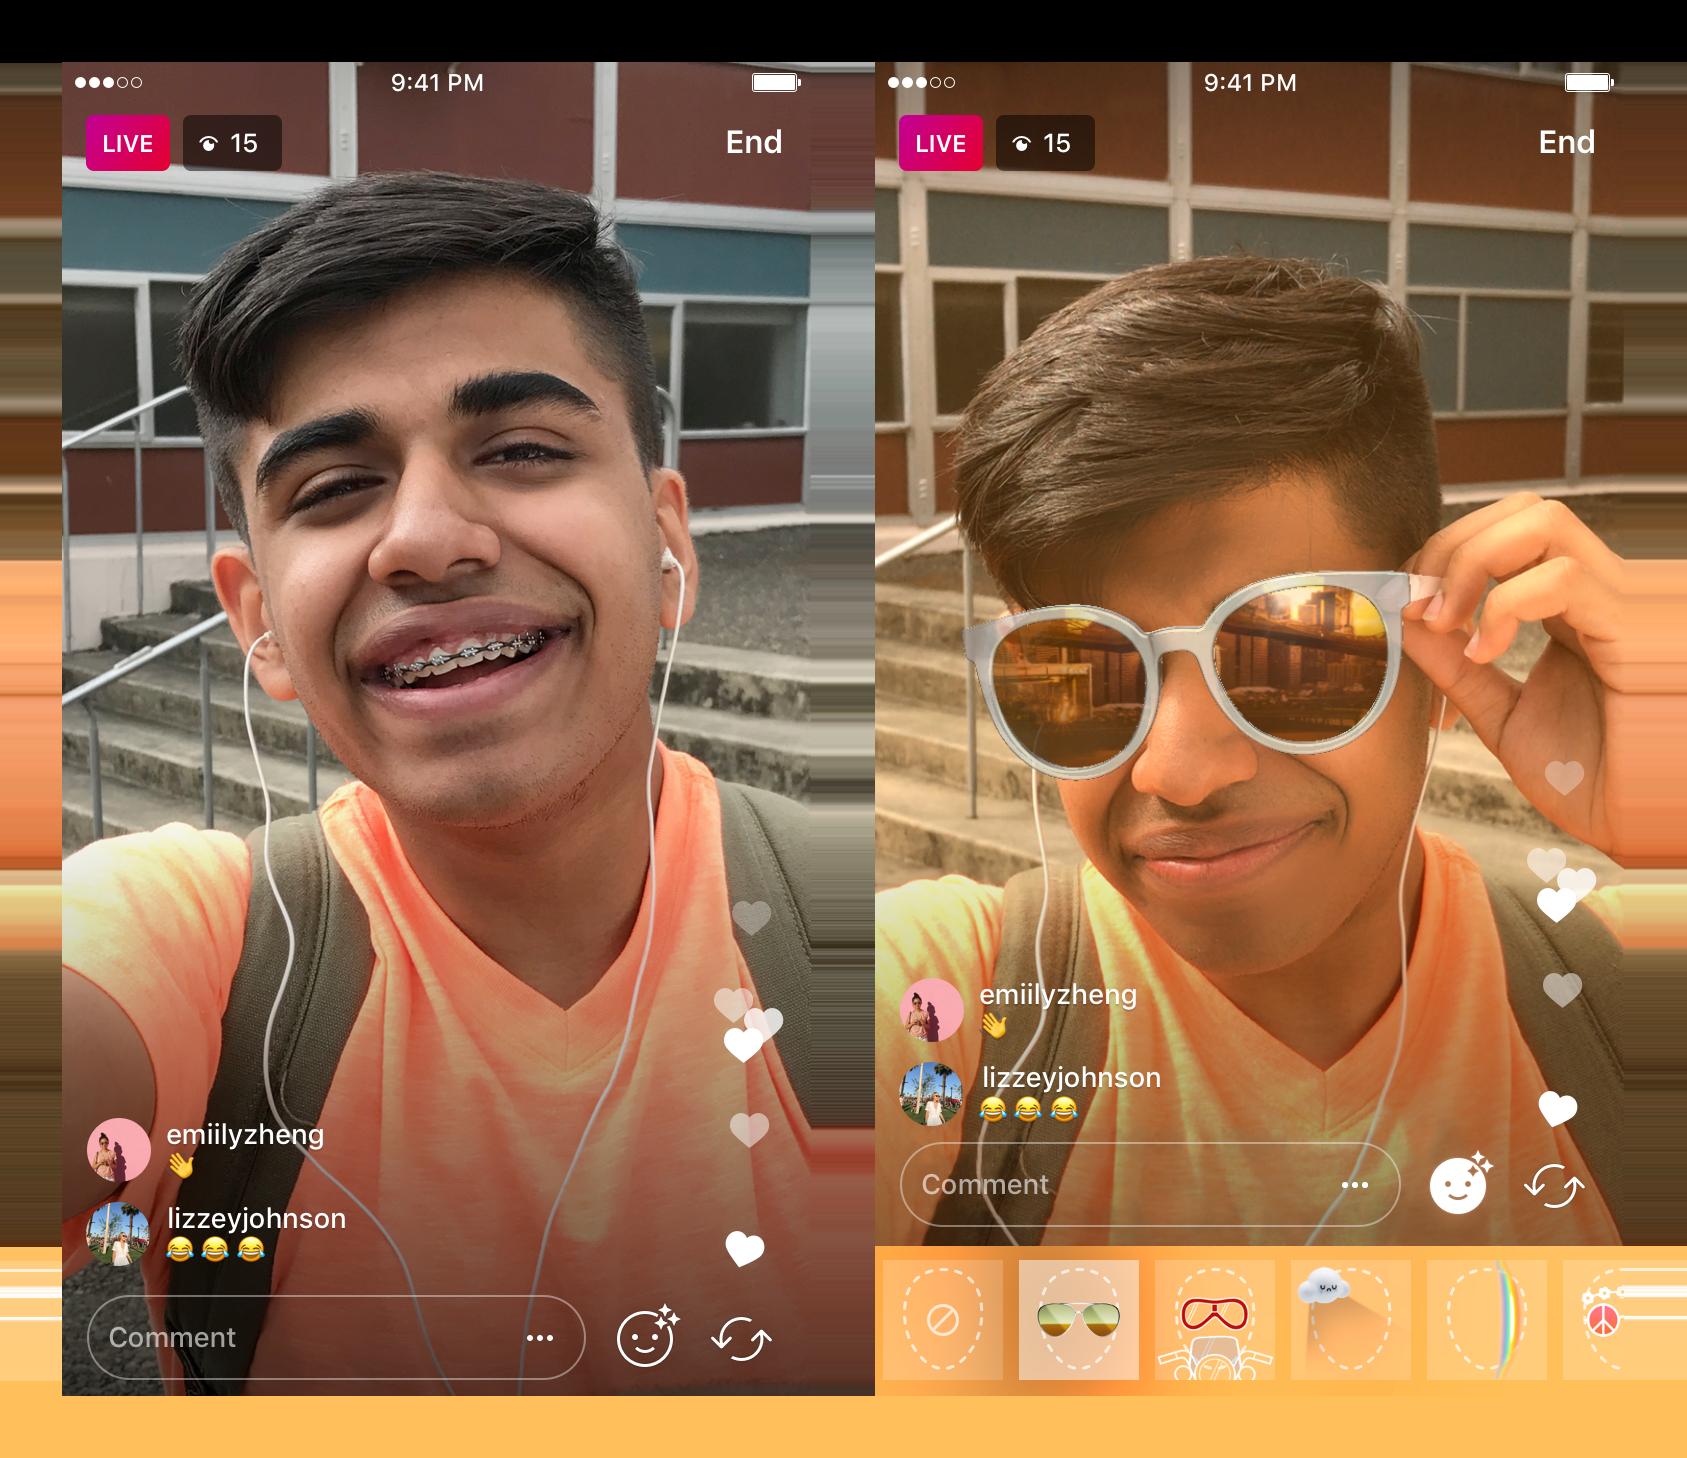 Novo recurso de filtros faciais ao vivo do Instagram